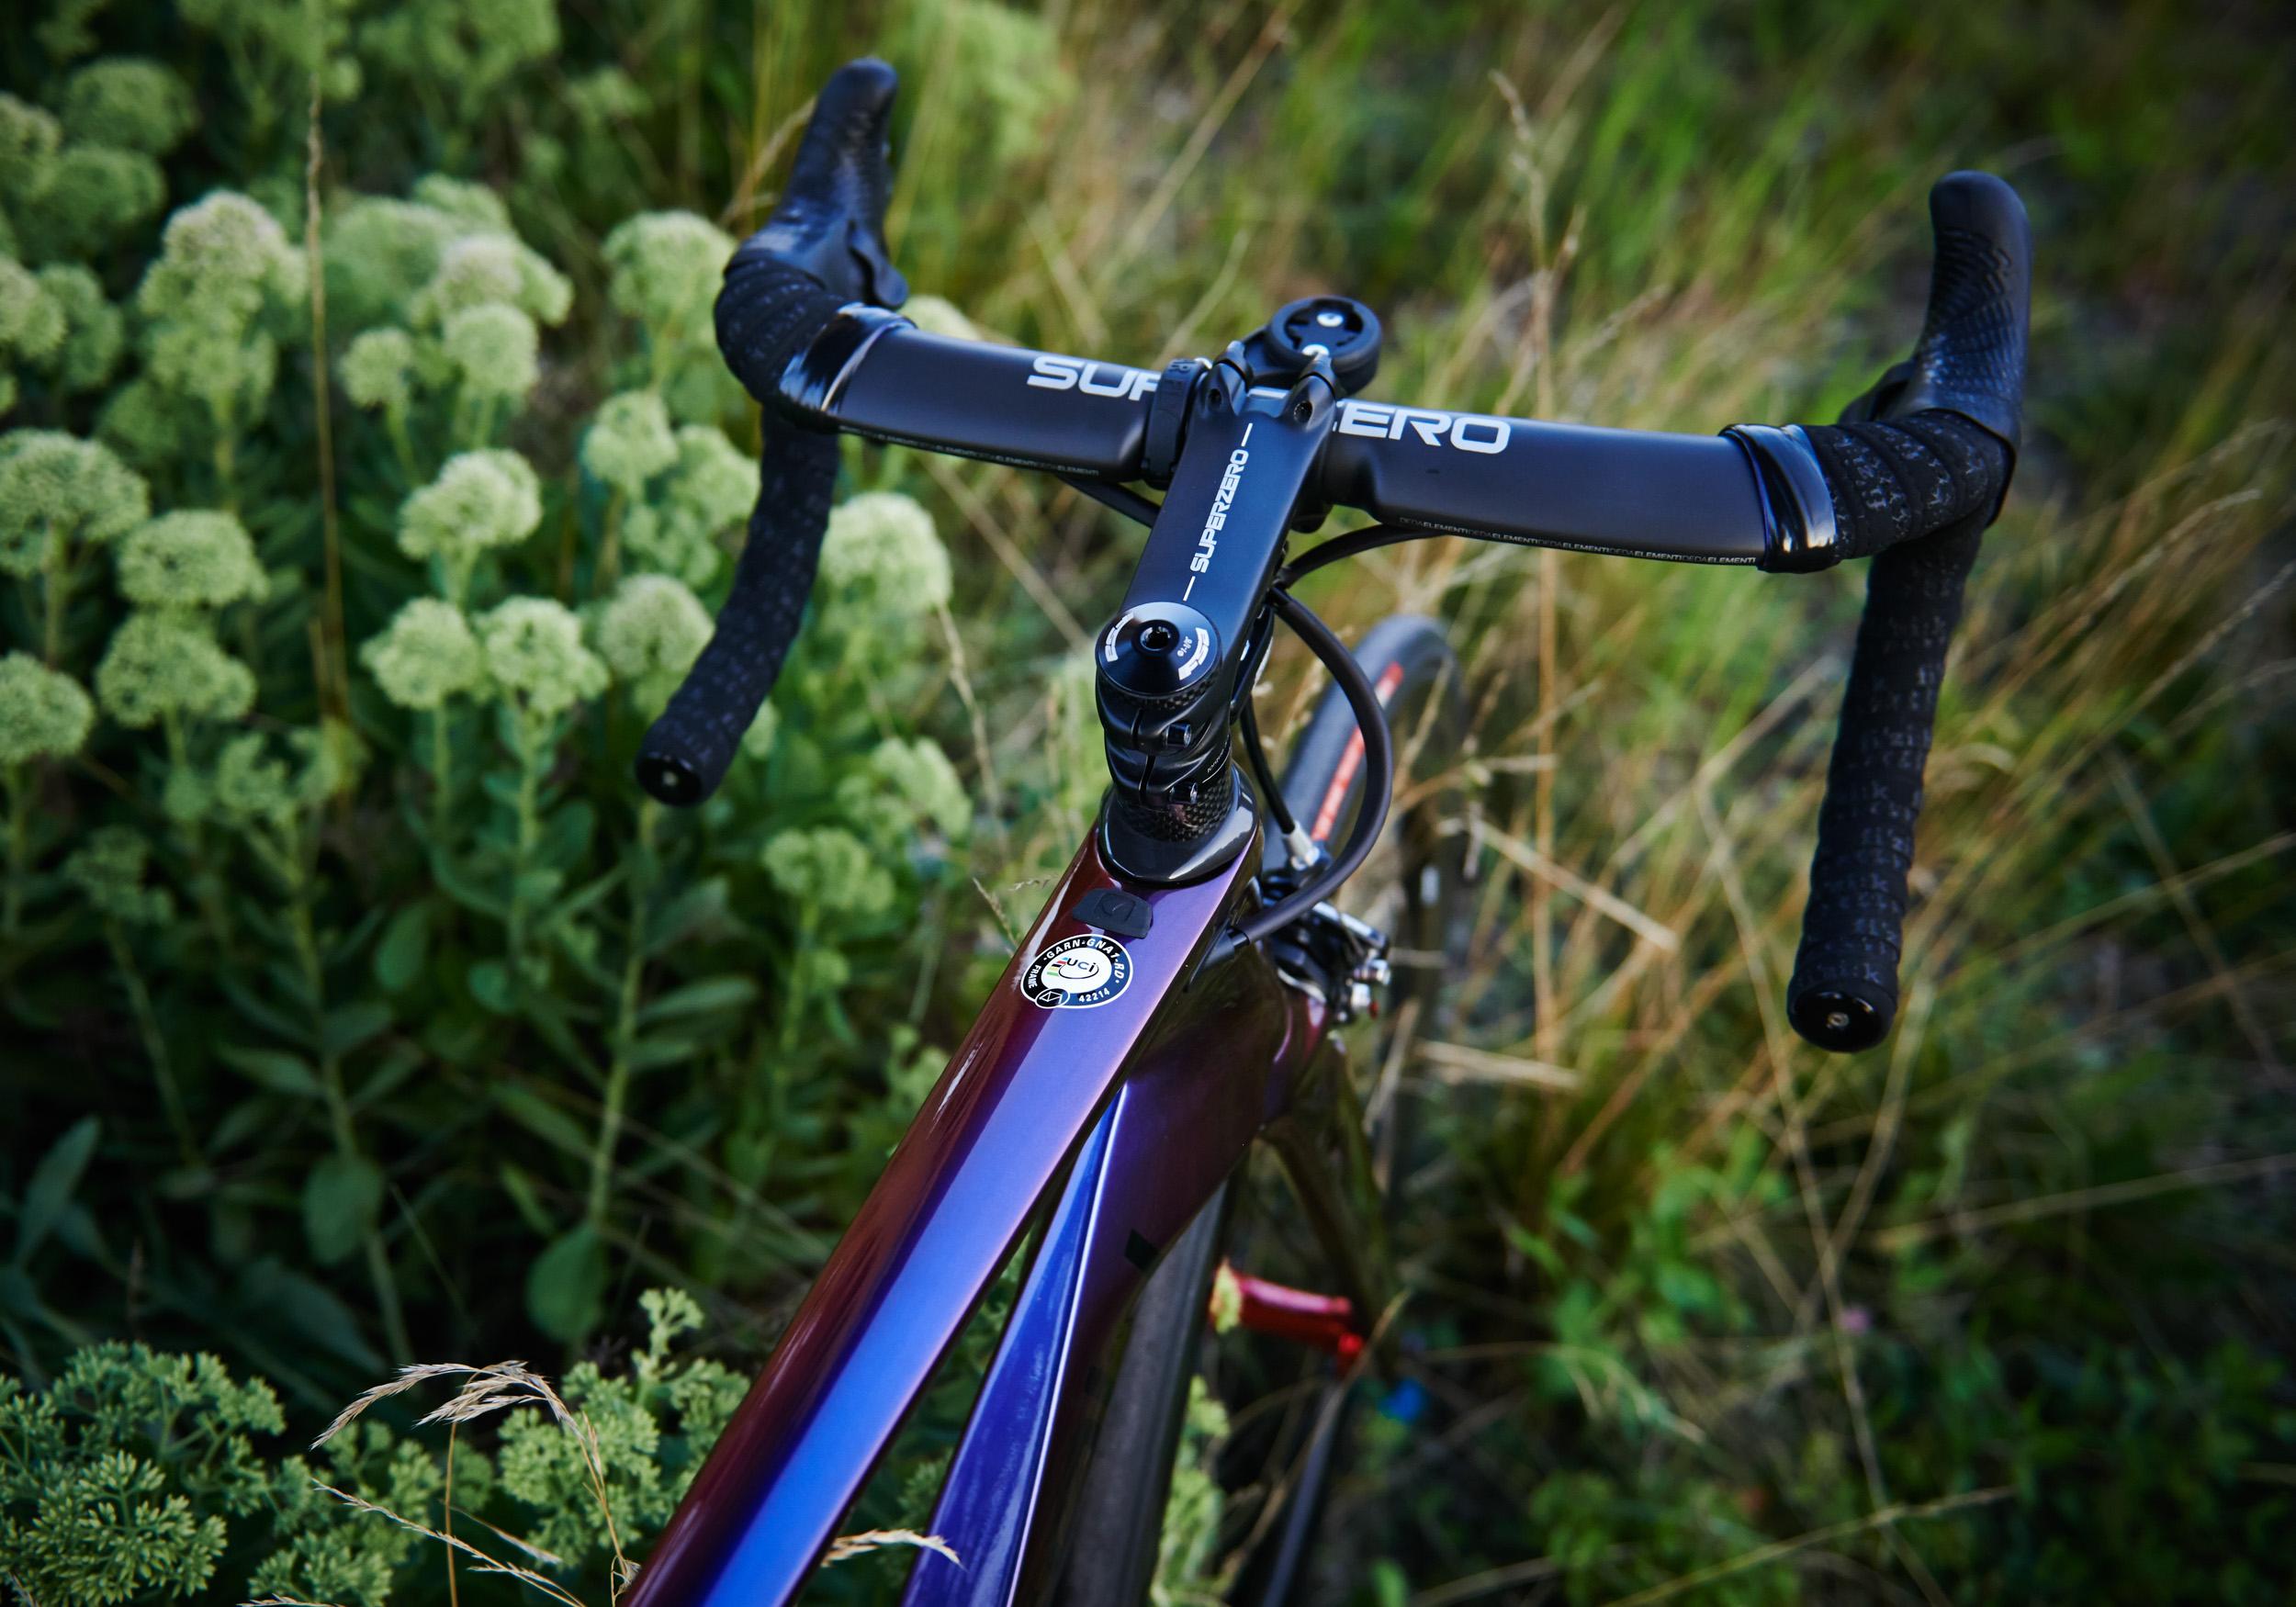 to-be-determined-garneau-a1-bike-review-103.jpg